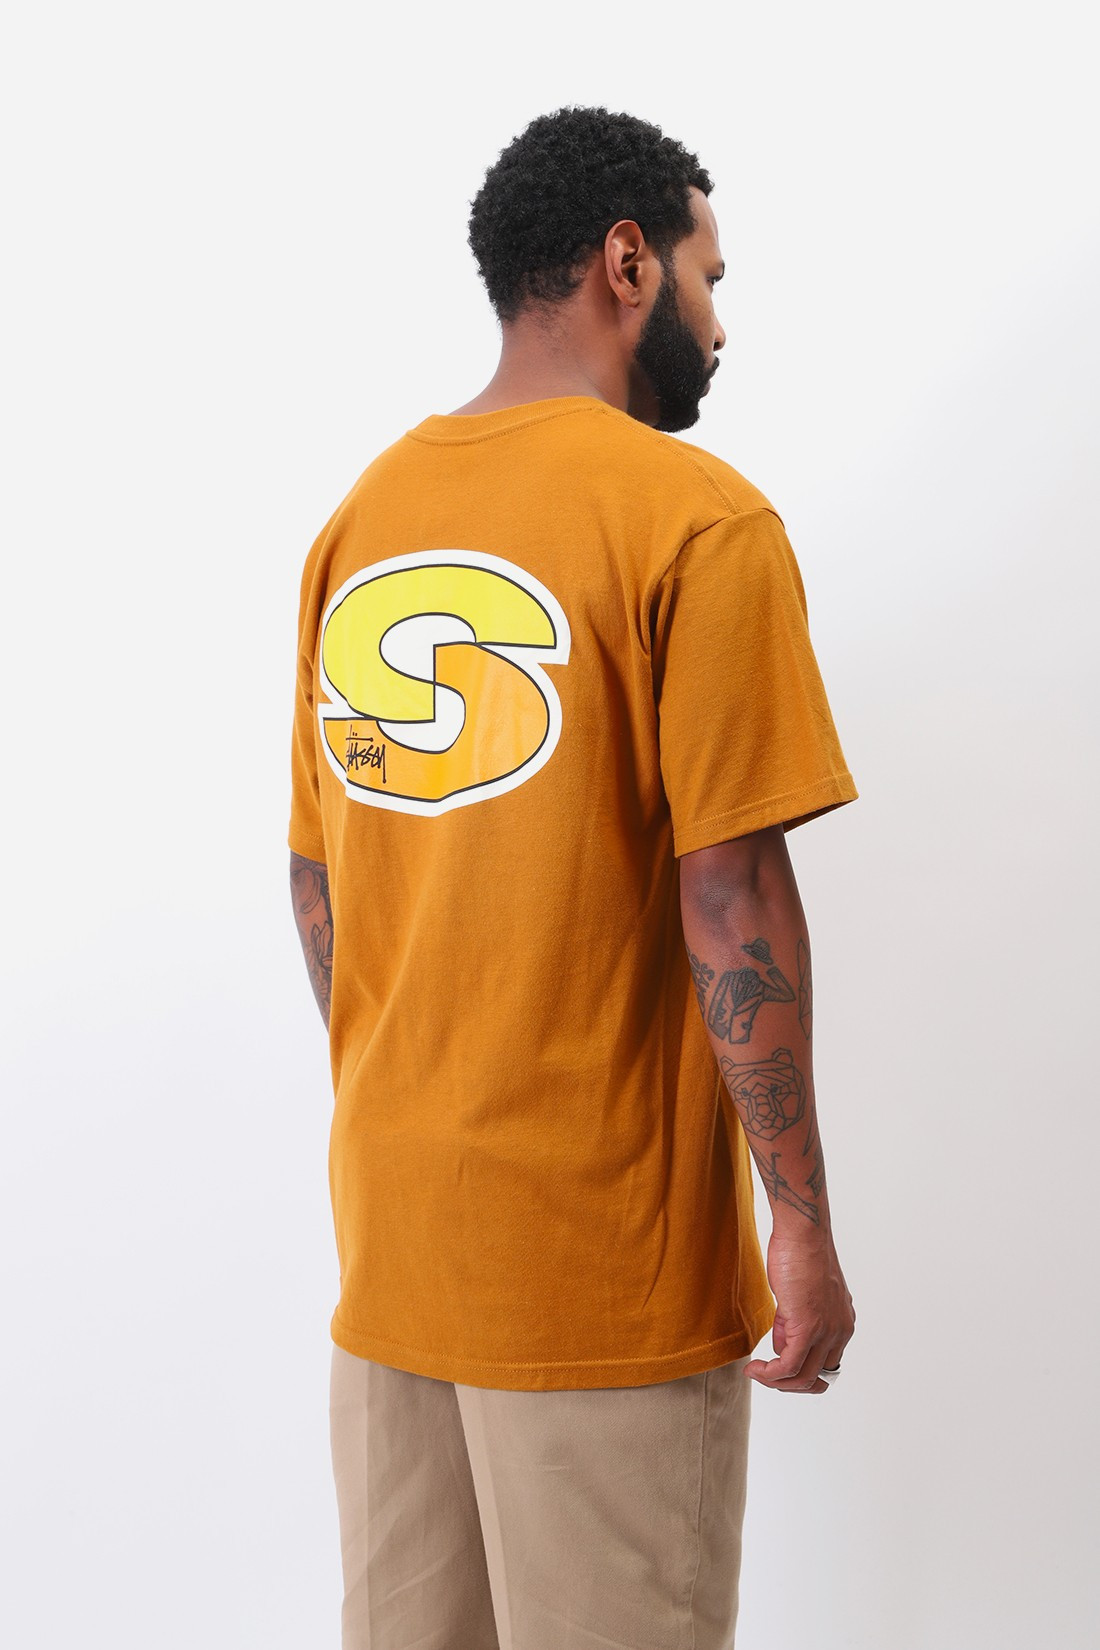 STUSSY / Super s tee Caramel